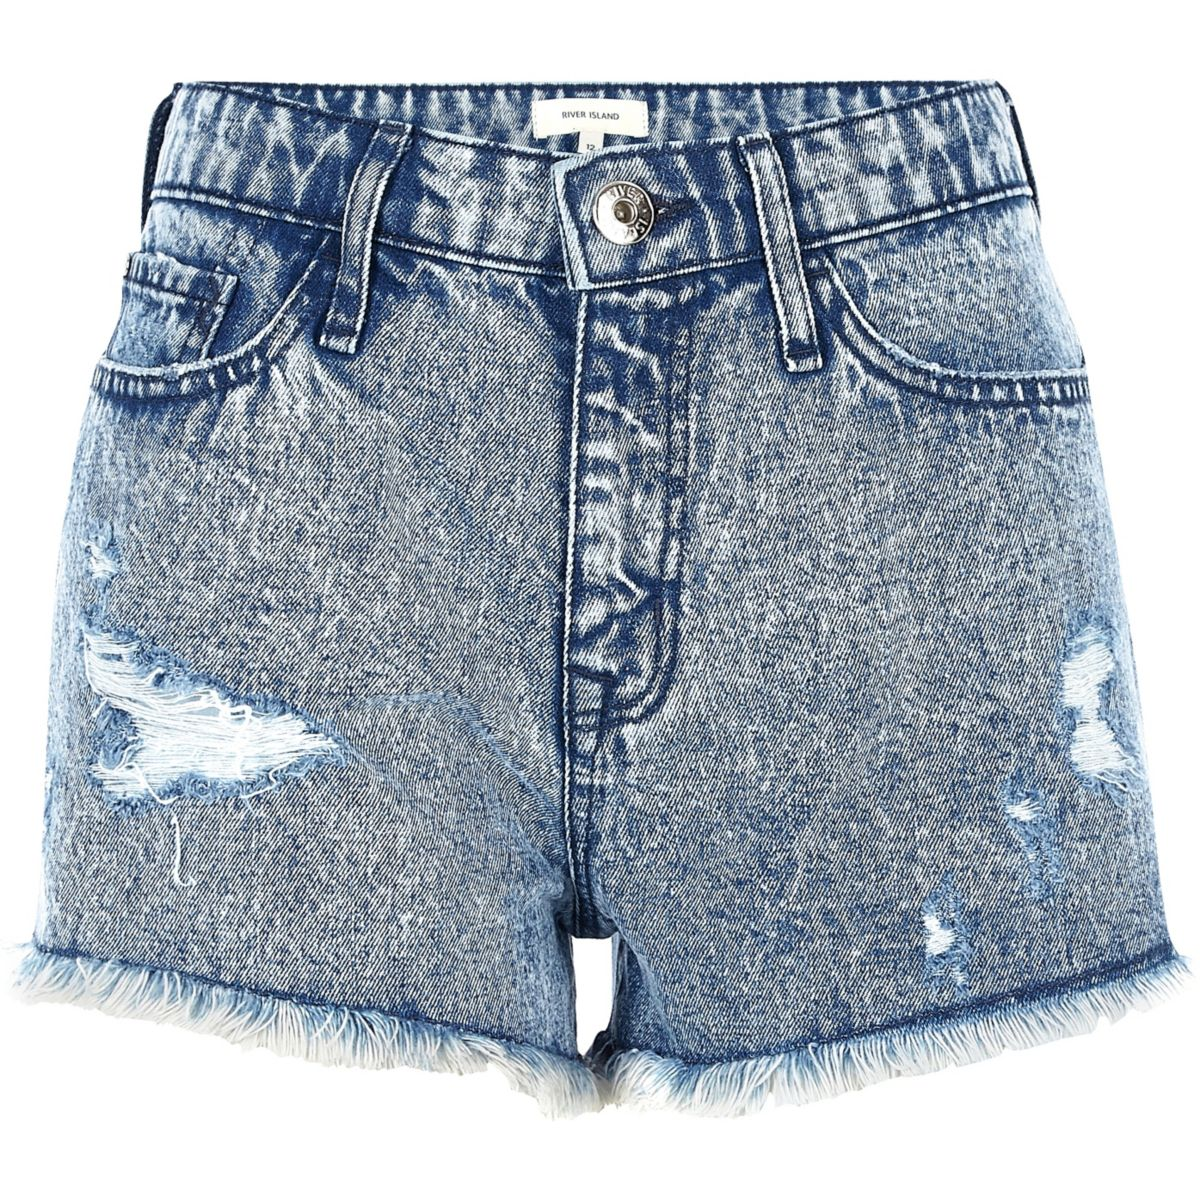 Blue acid wash ripped denim shorts